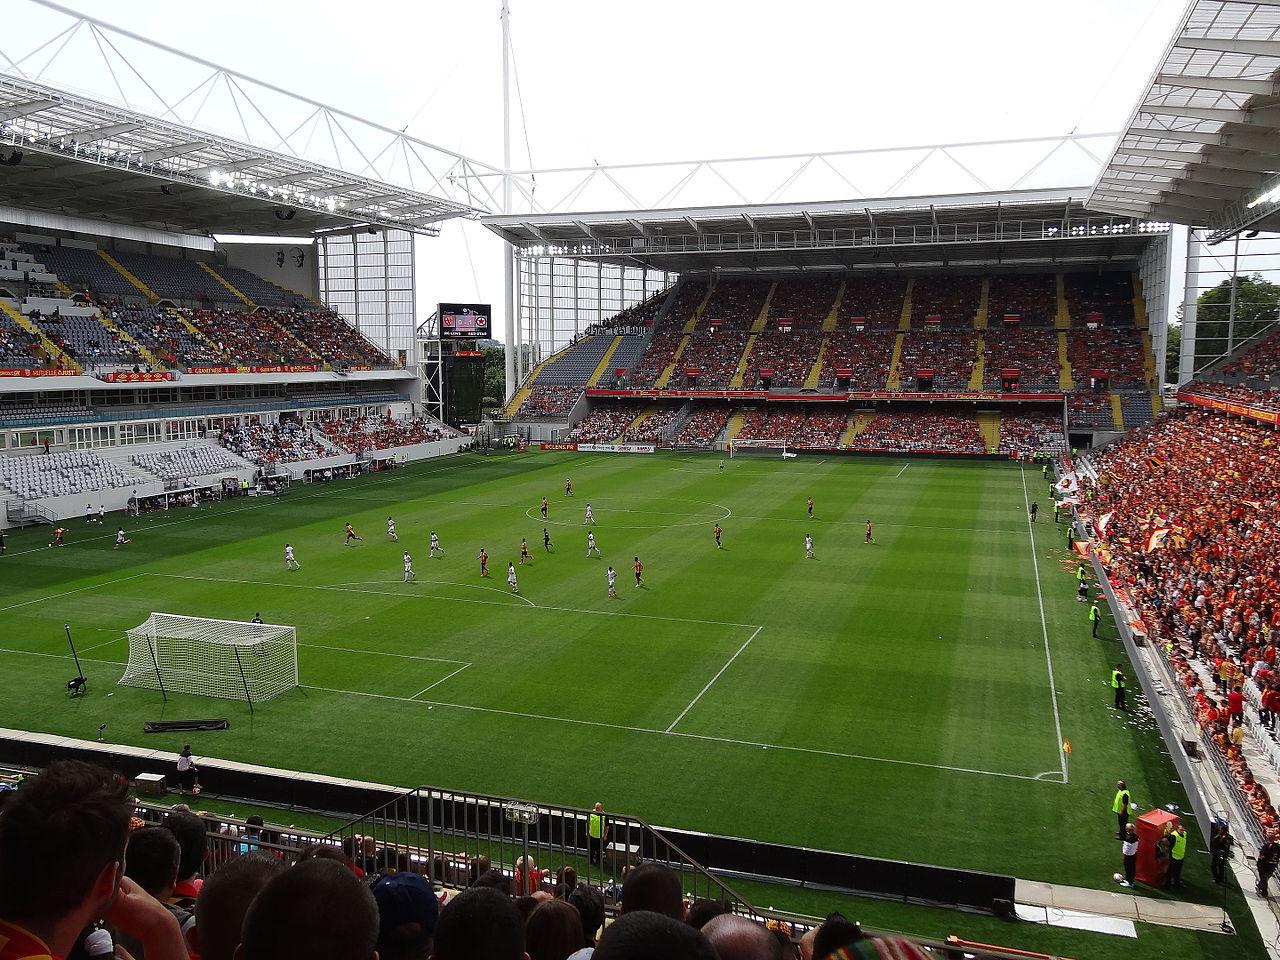 Stade Bollart-Delelis